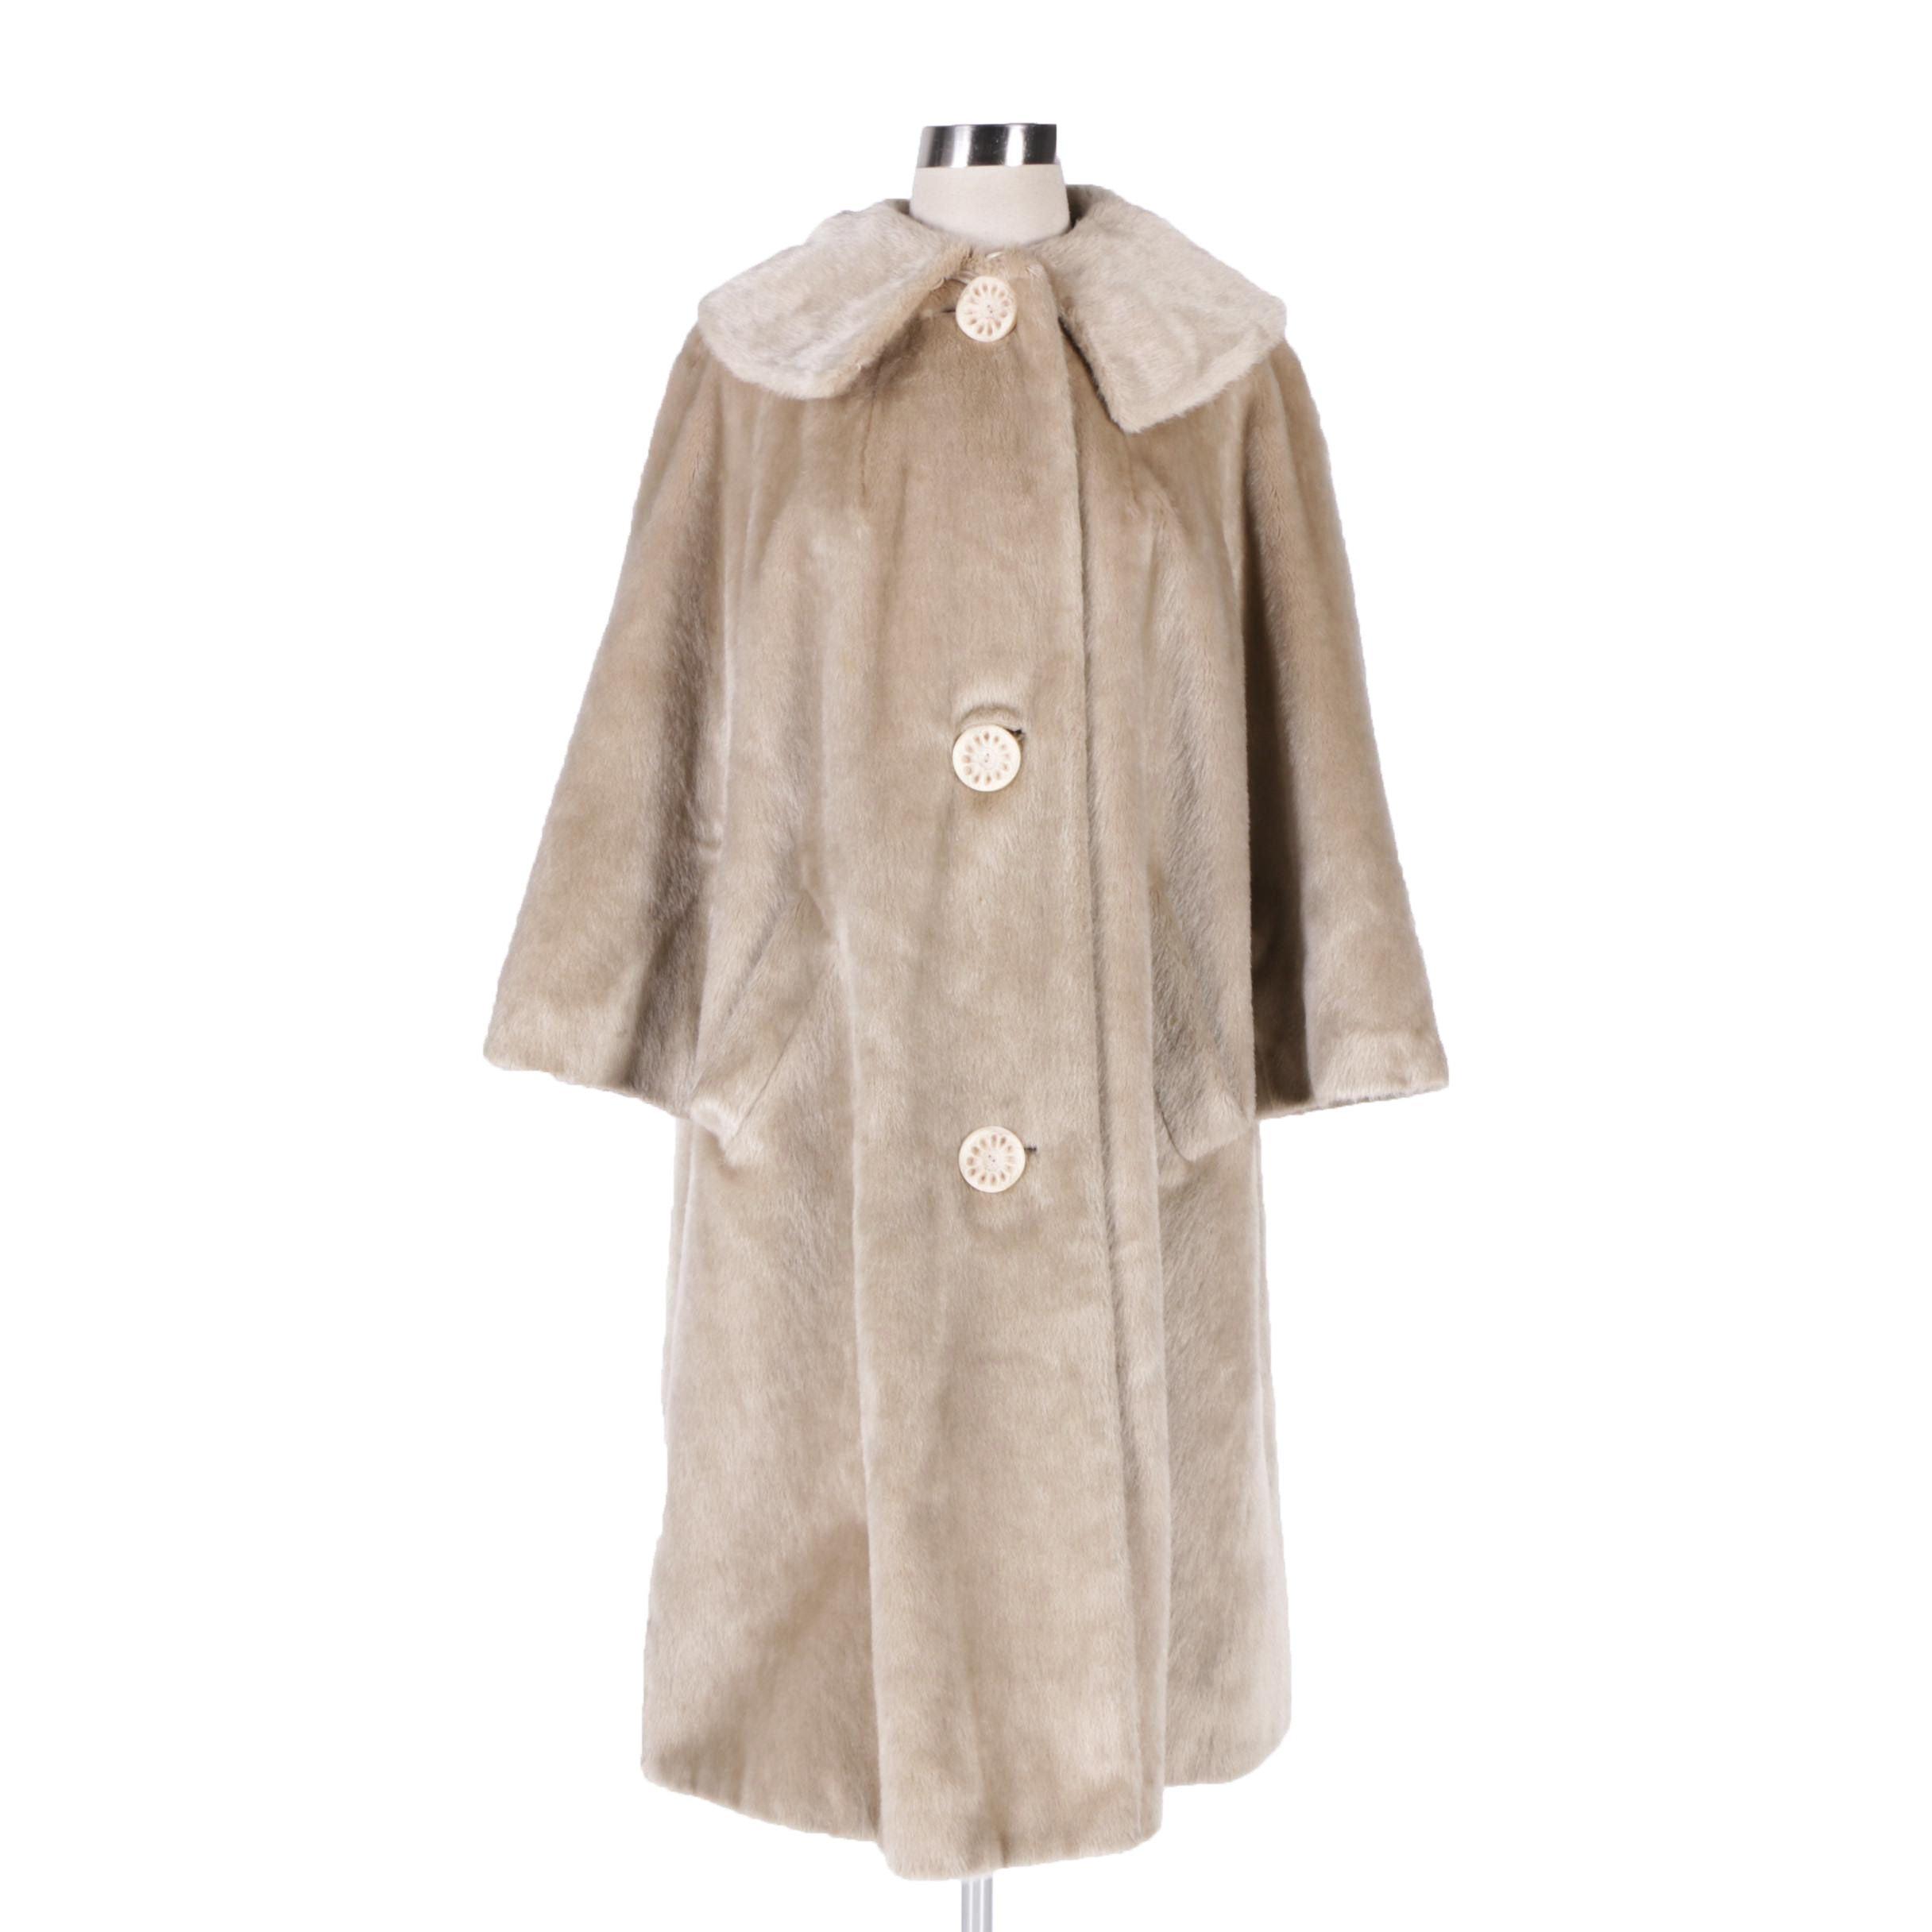 Women's Vintage Monnig's Brazotta by Sportowne Beige Faux Fur Coat